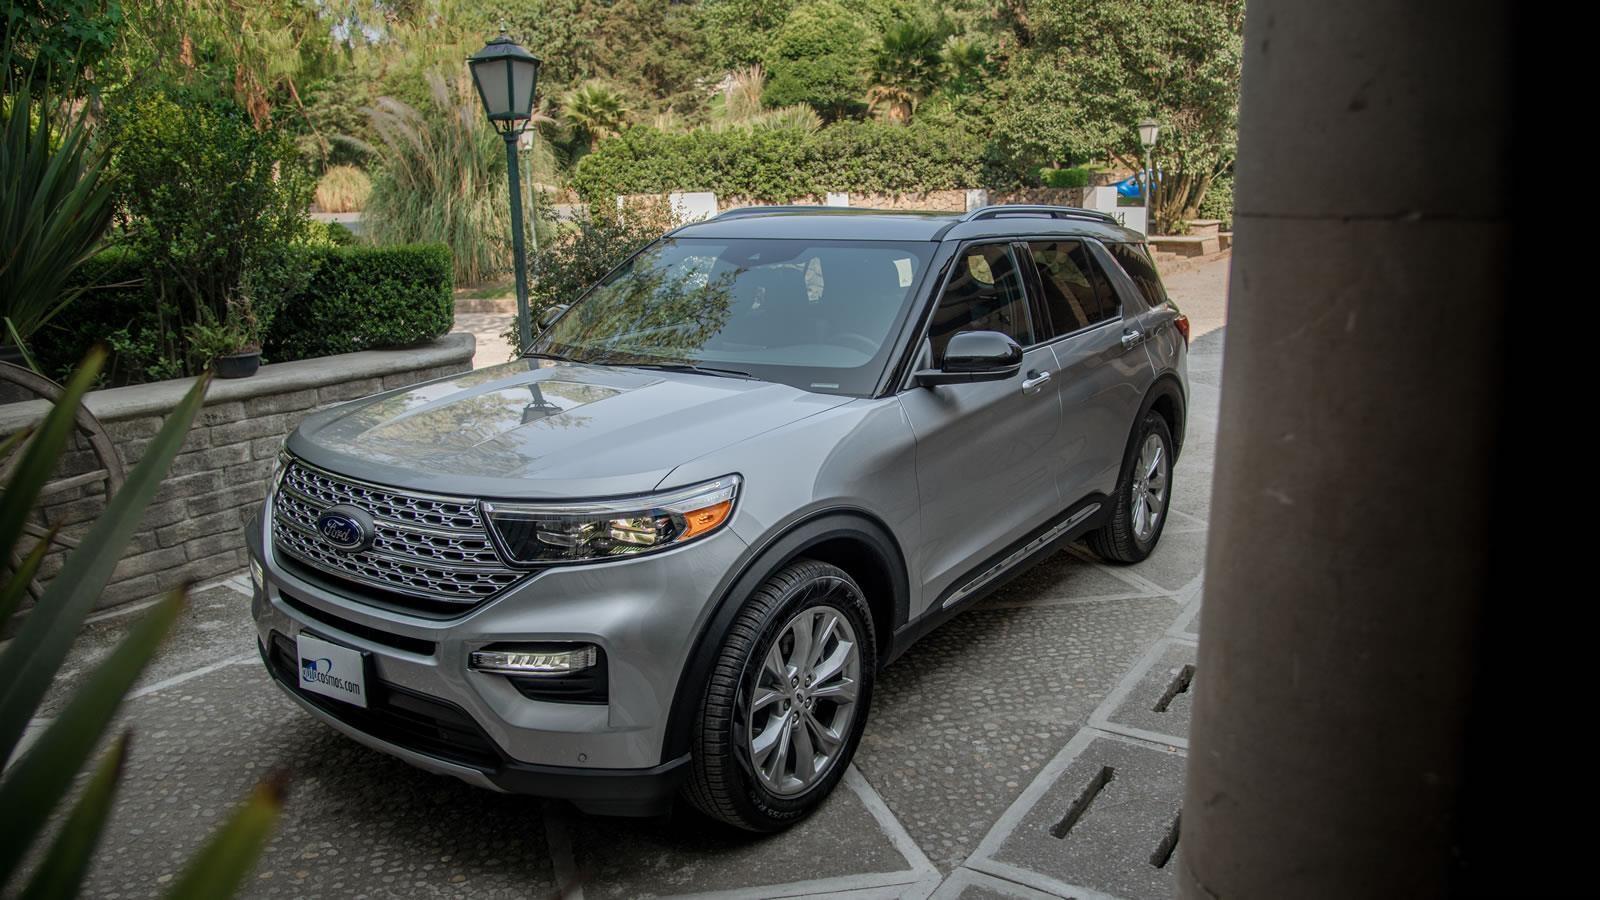 Manejamos la Ford Explorer 2020